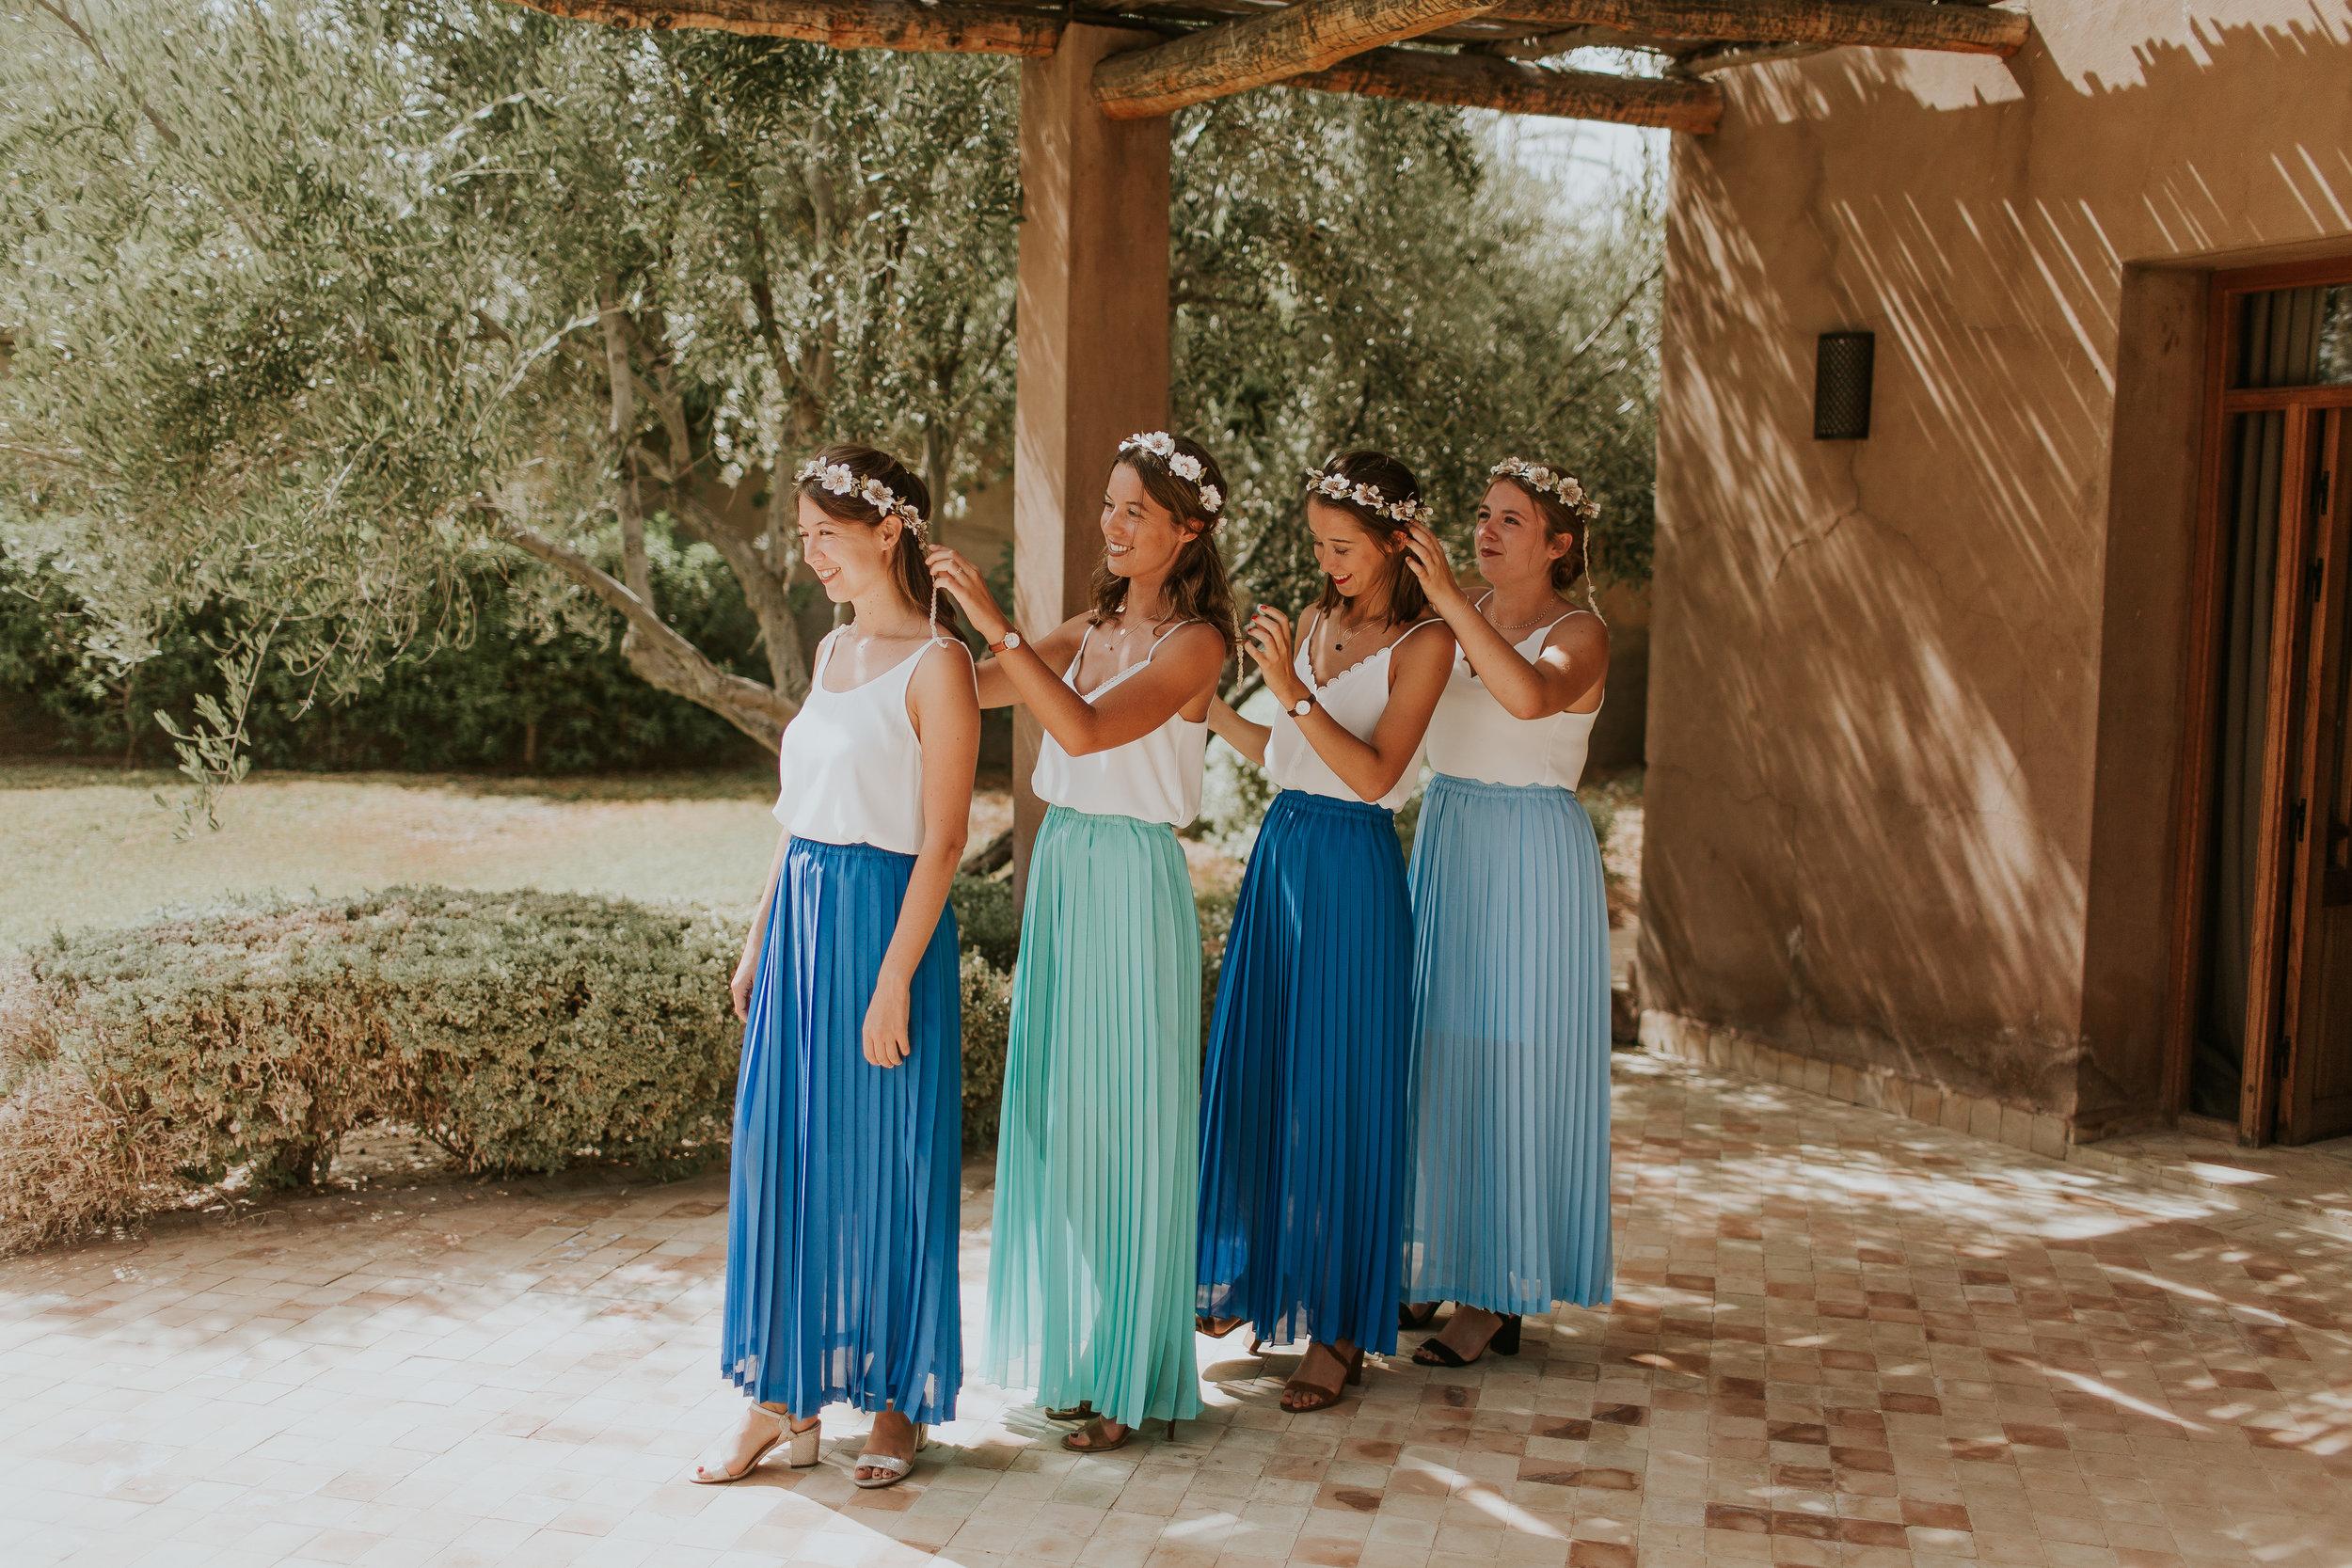 morganedimitri_davidmaire_marrakech_destinationwedding-93.jpg